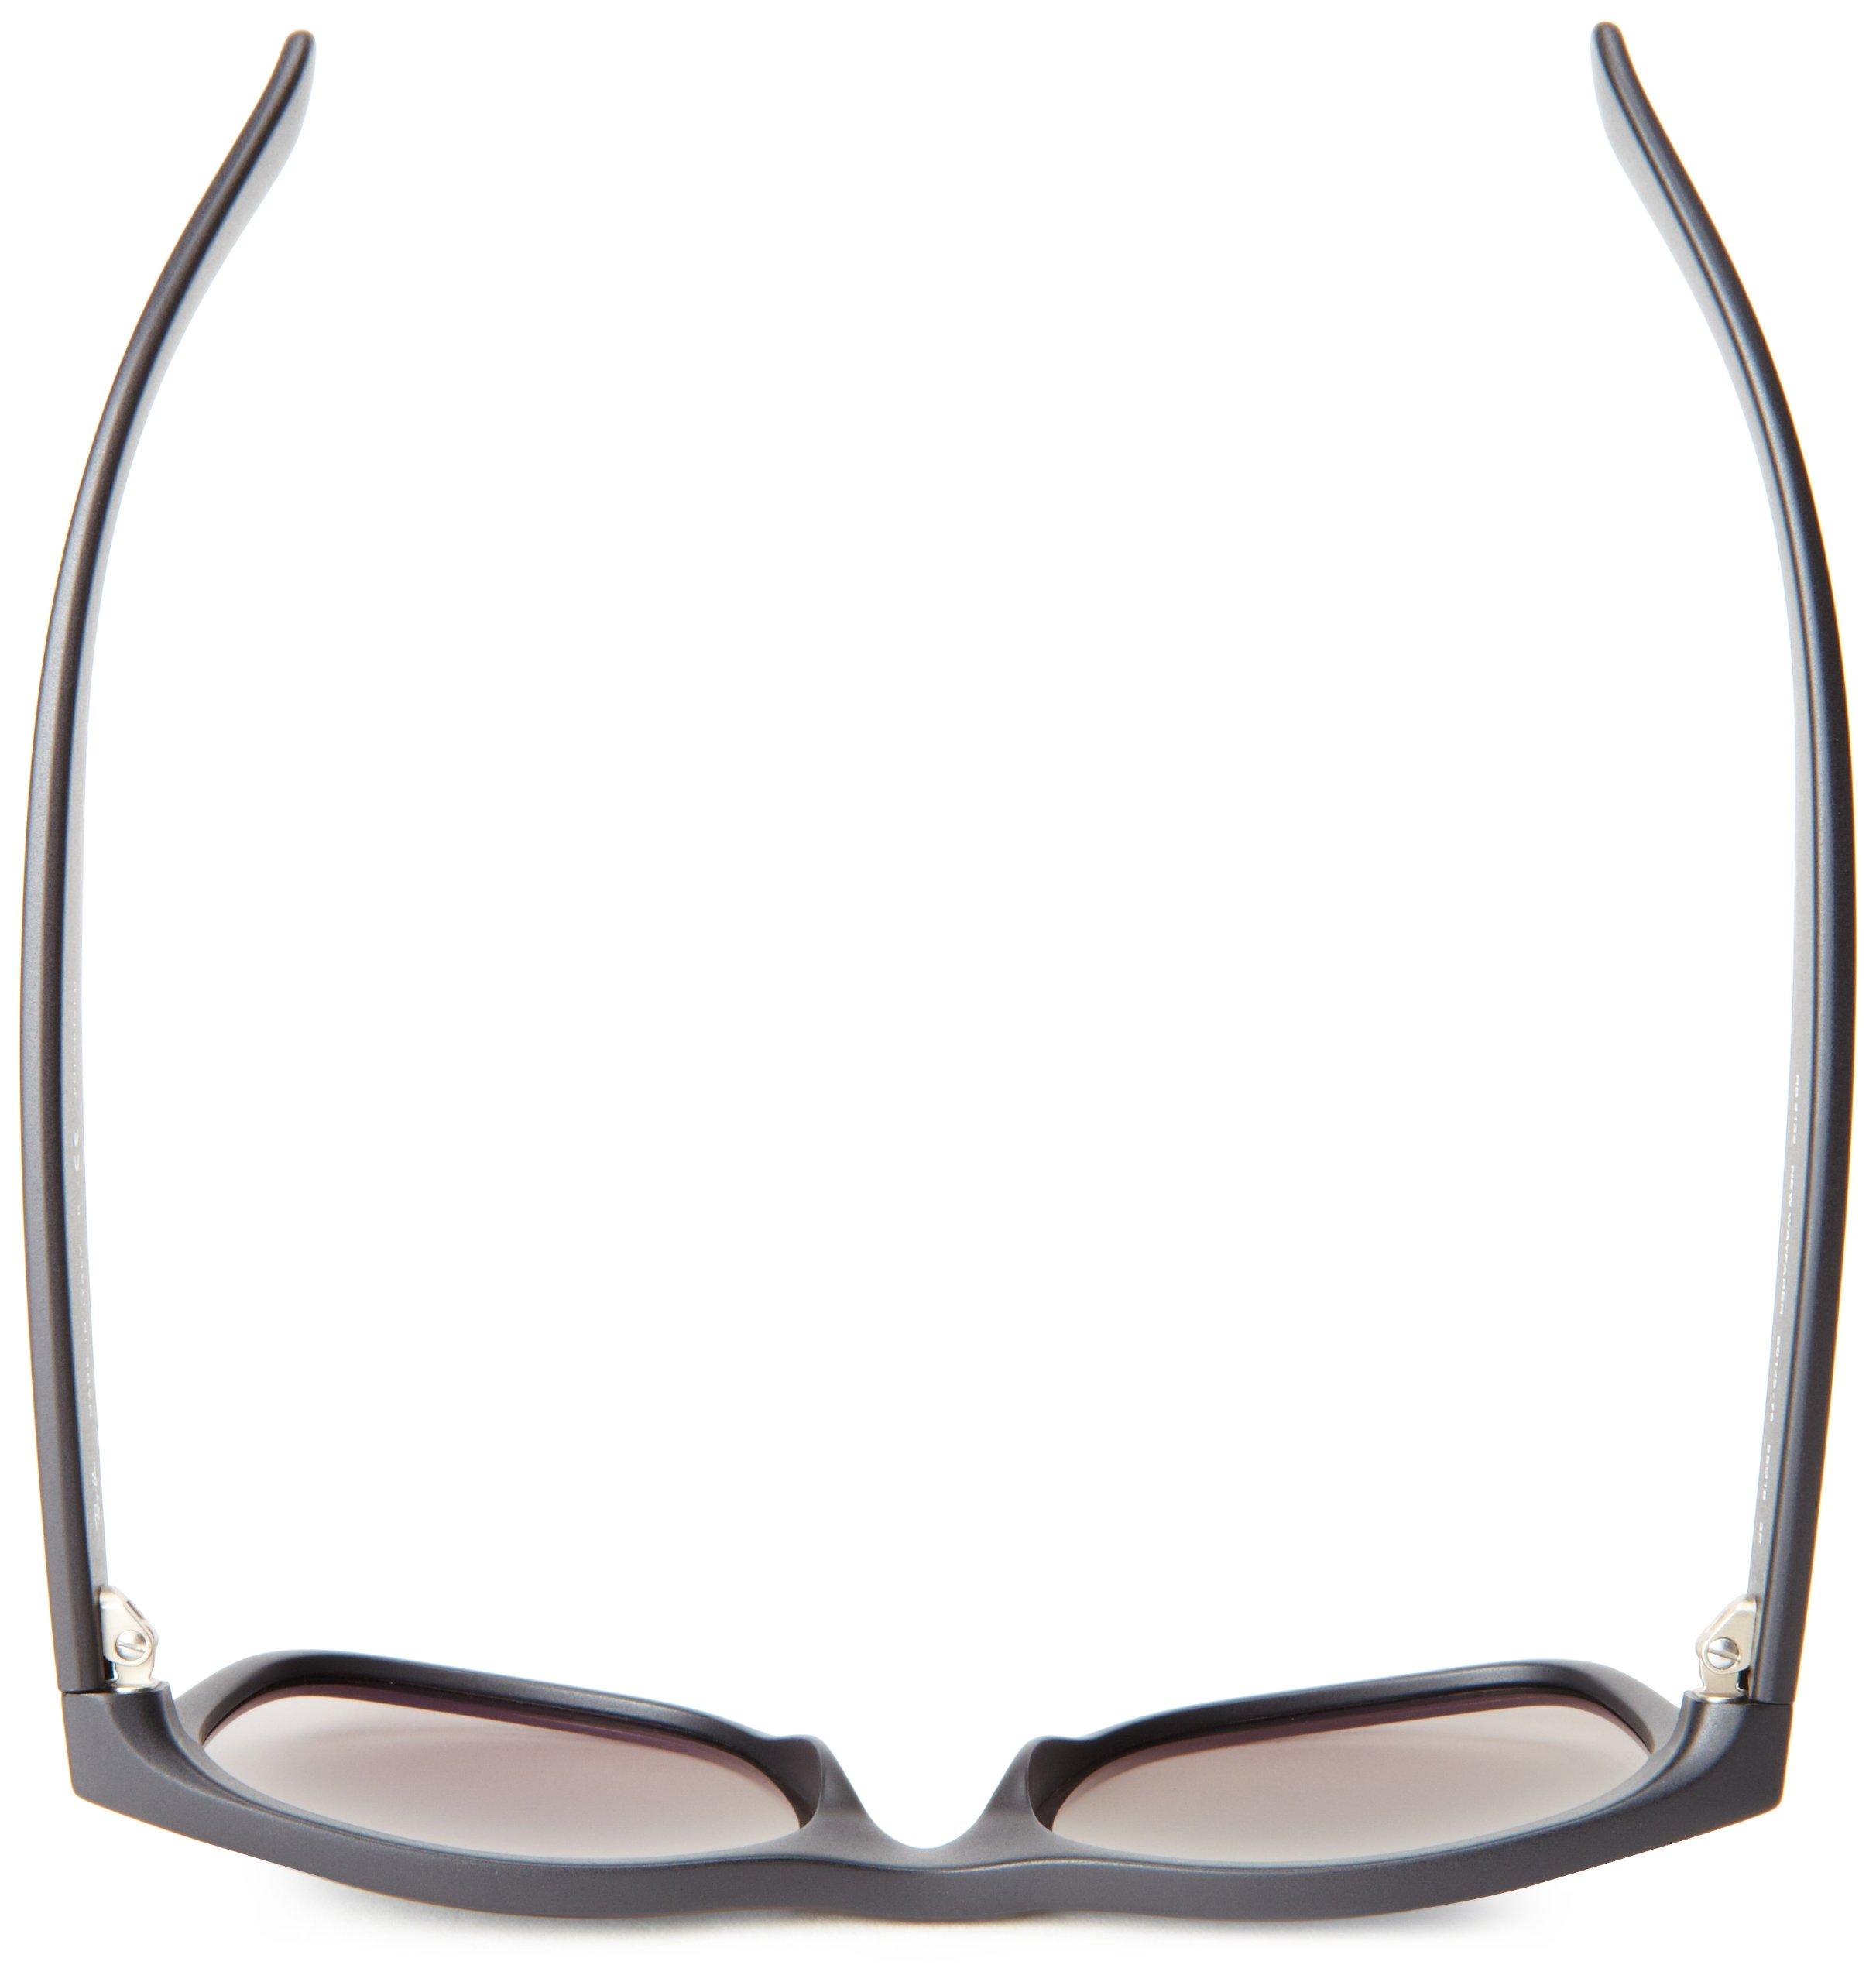 Ray-Ban Unisex New Wayfarer Polarized Sunglasses, Black/Polarized Blue/Grey Gradient, Blue Gradient Grey, 55mm by Ray-Ban (Image #5)